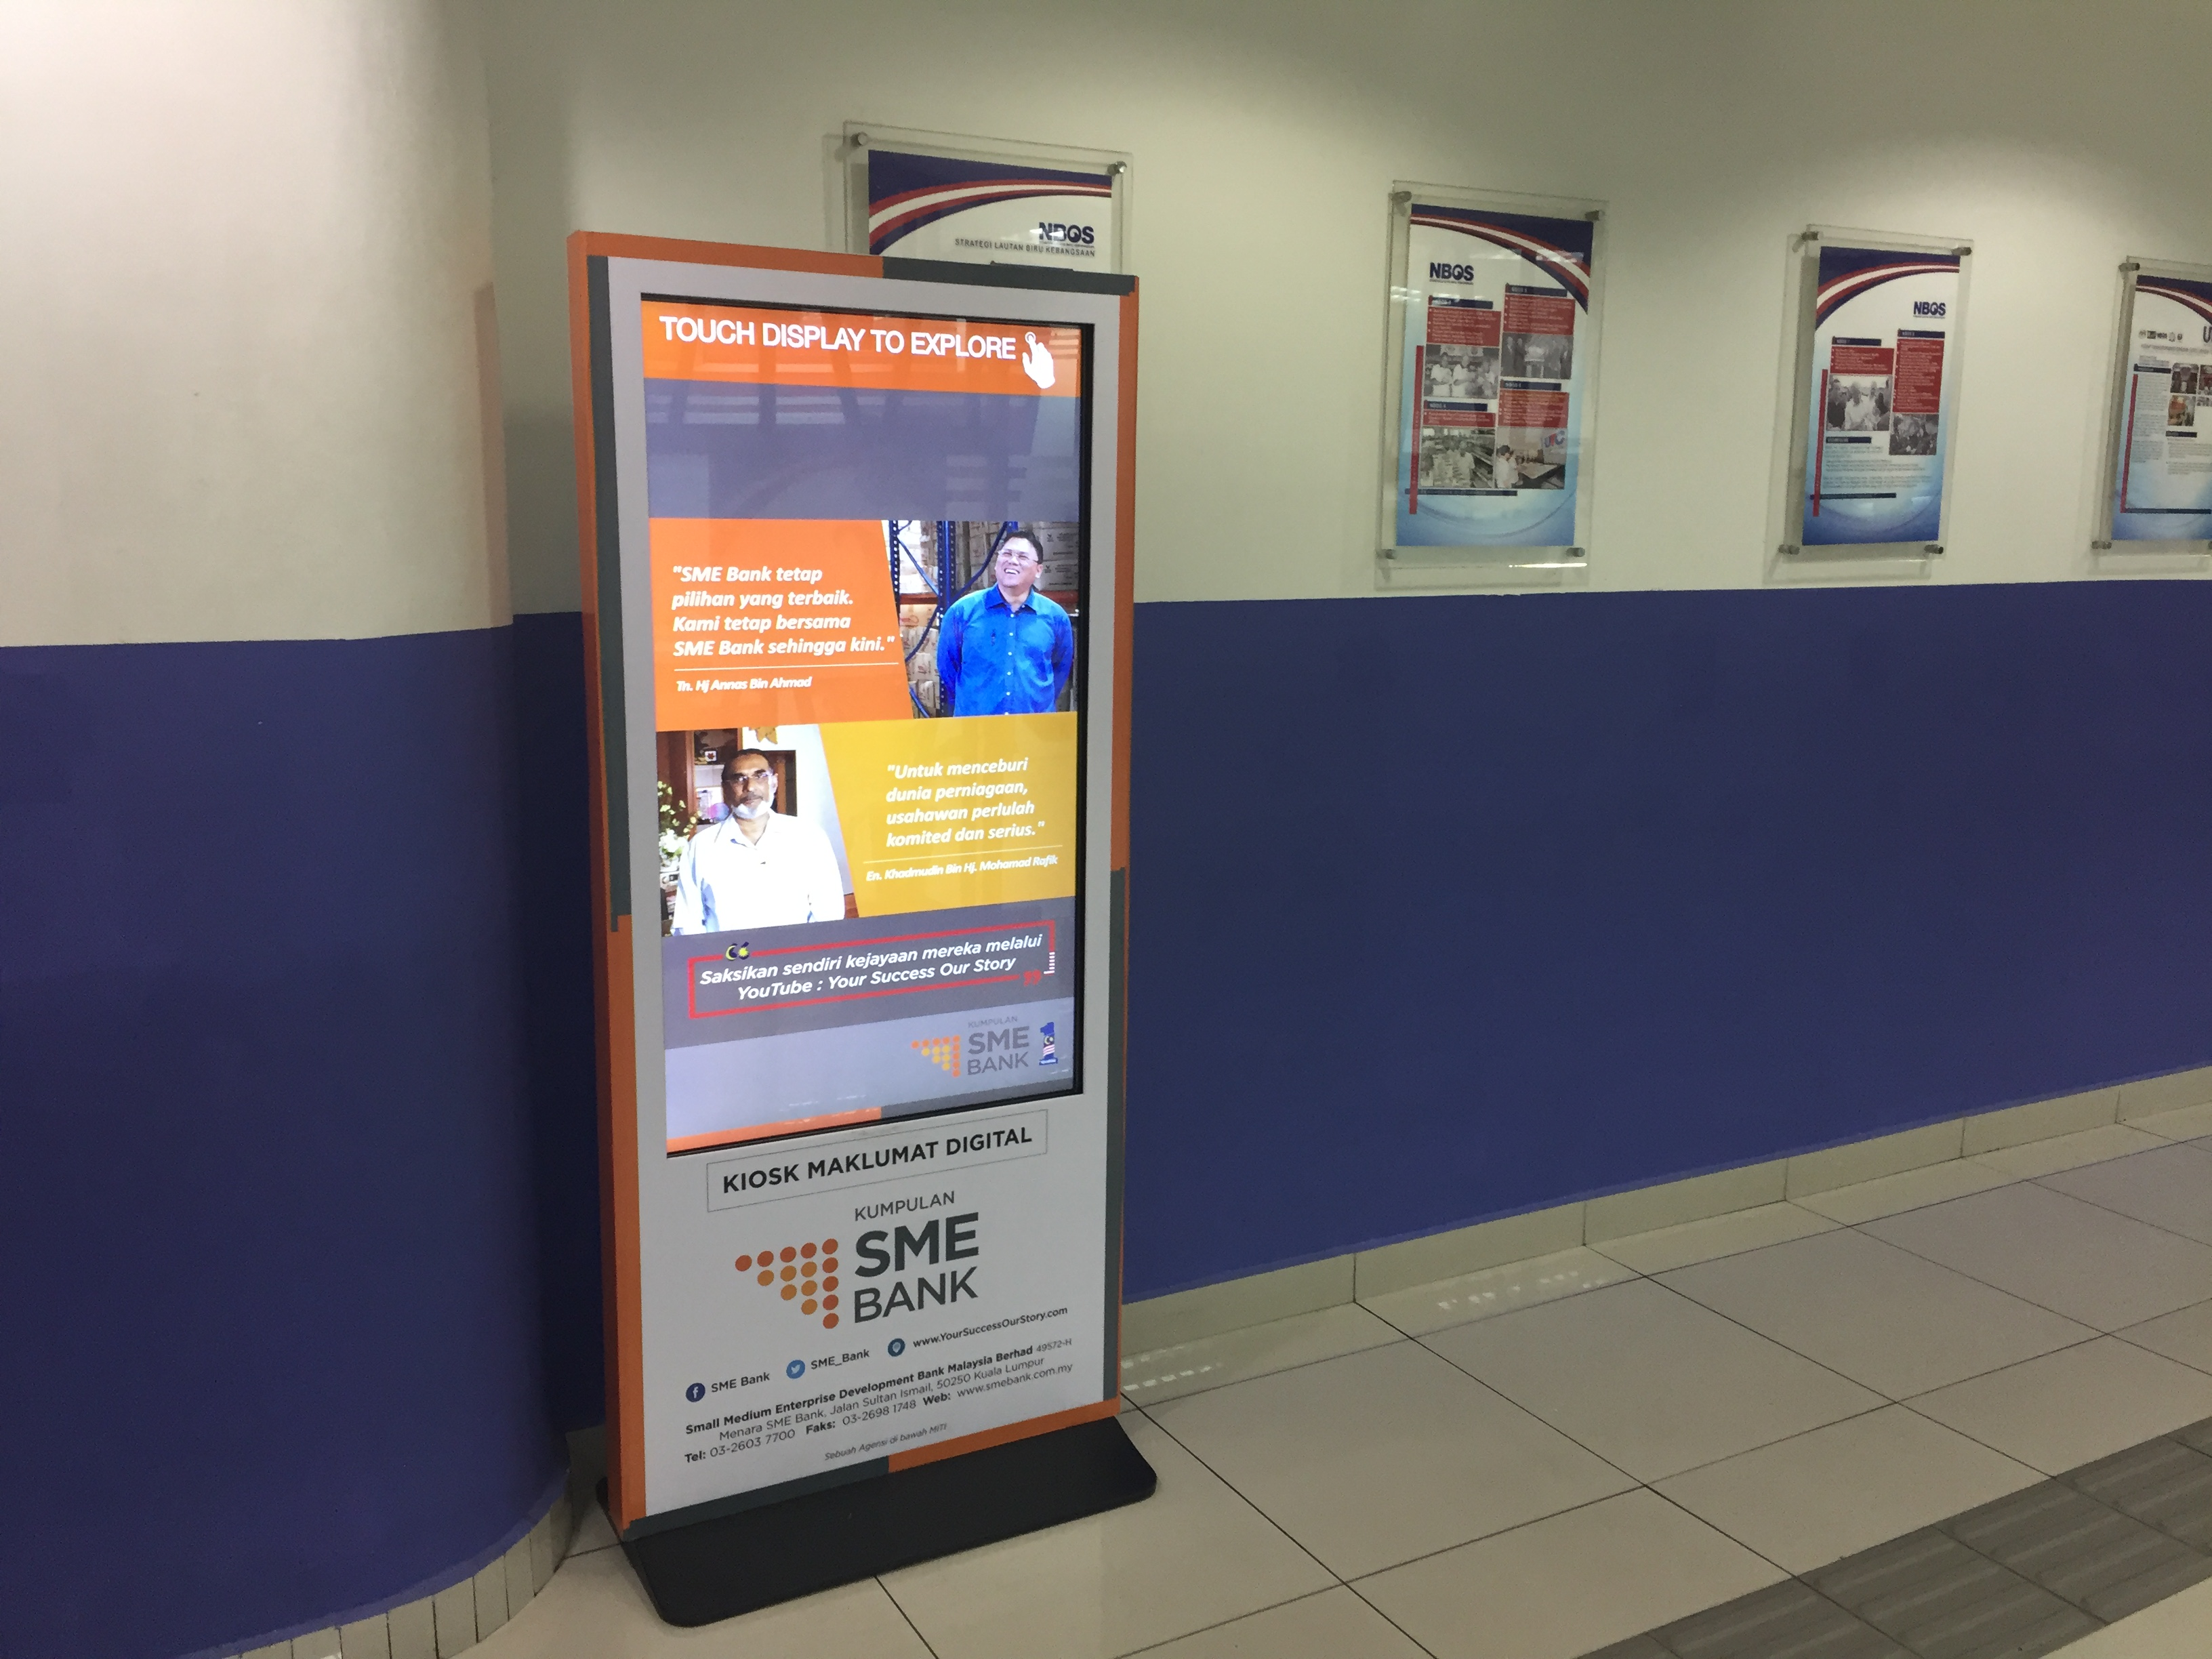 Digital Signage Malaysia